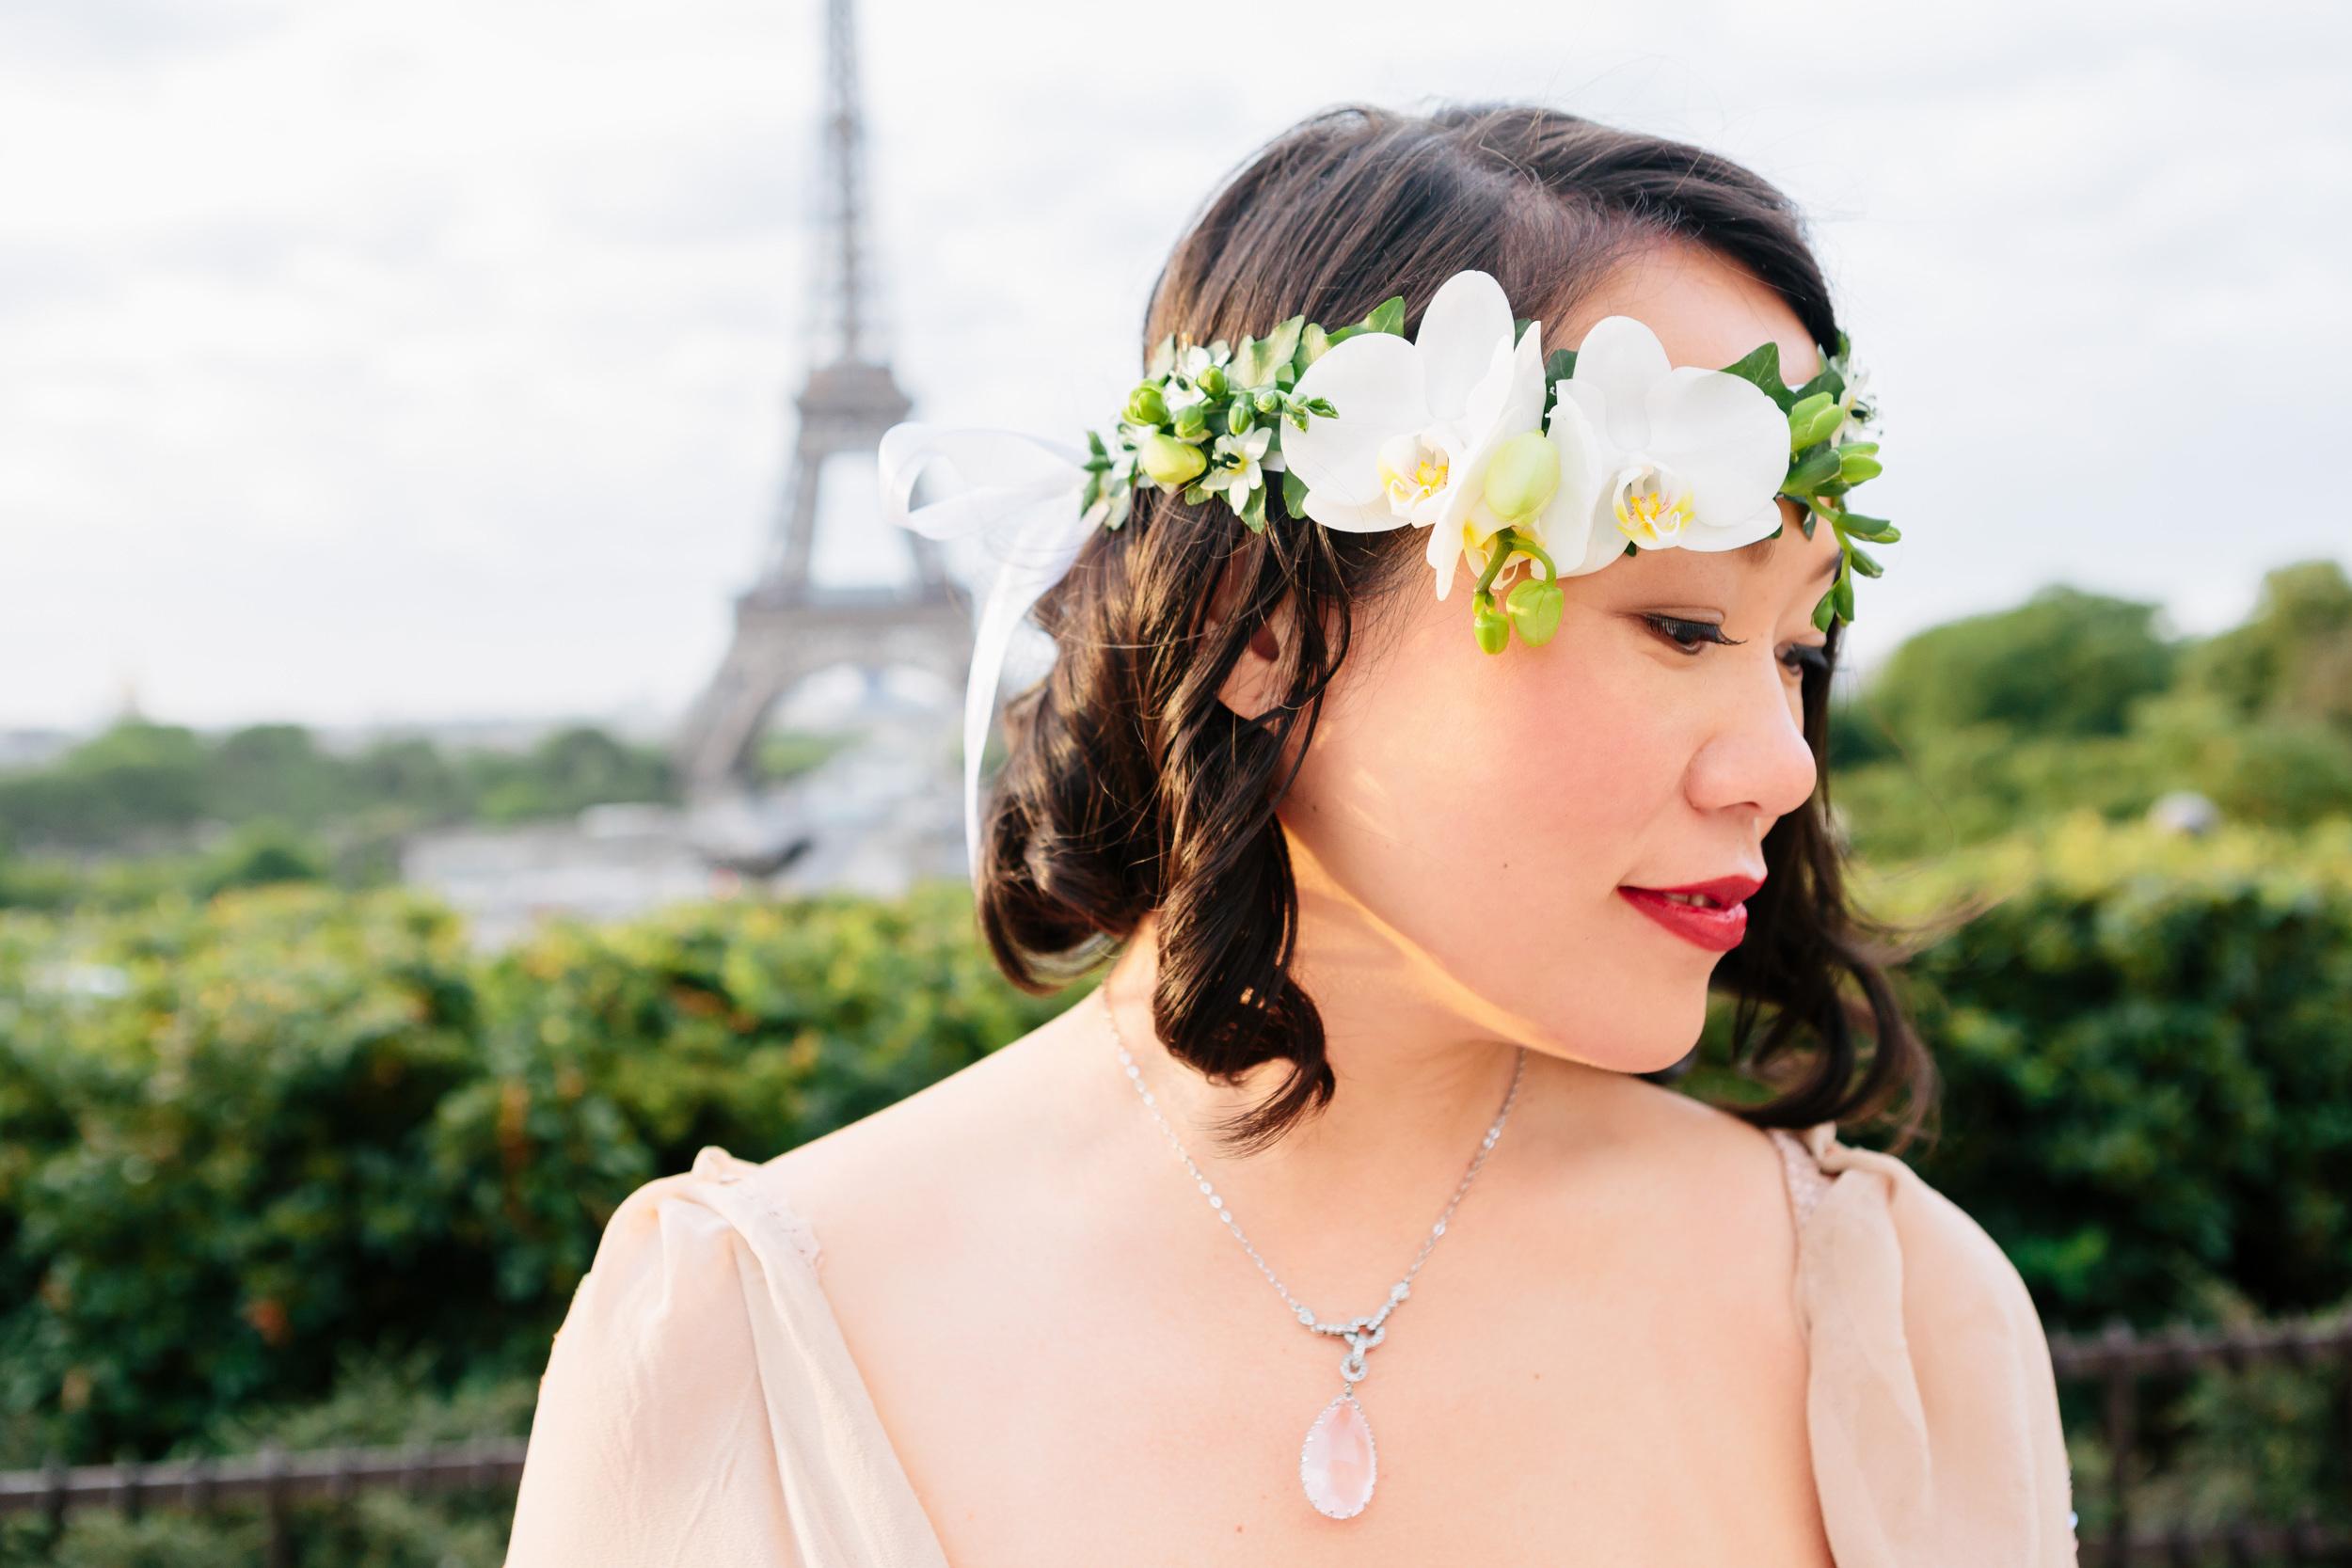 Photographer in Paris, Eiffel Tower, Birthday, flowers, personal branding, IheartParisfr